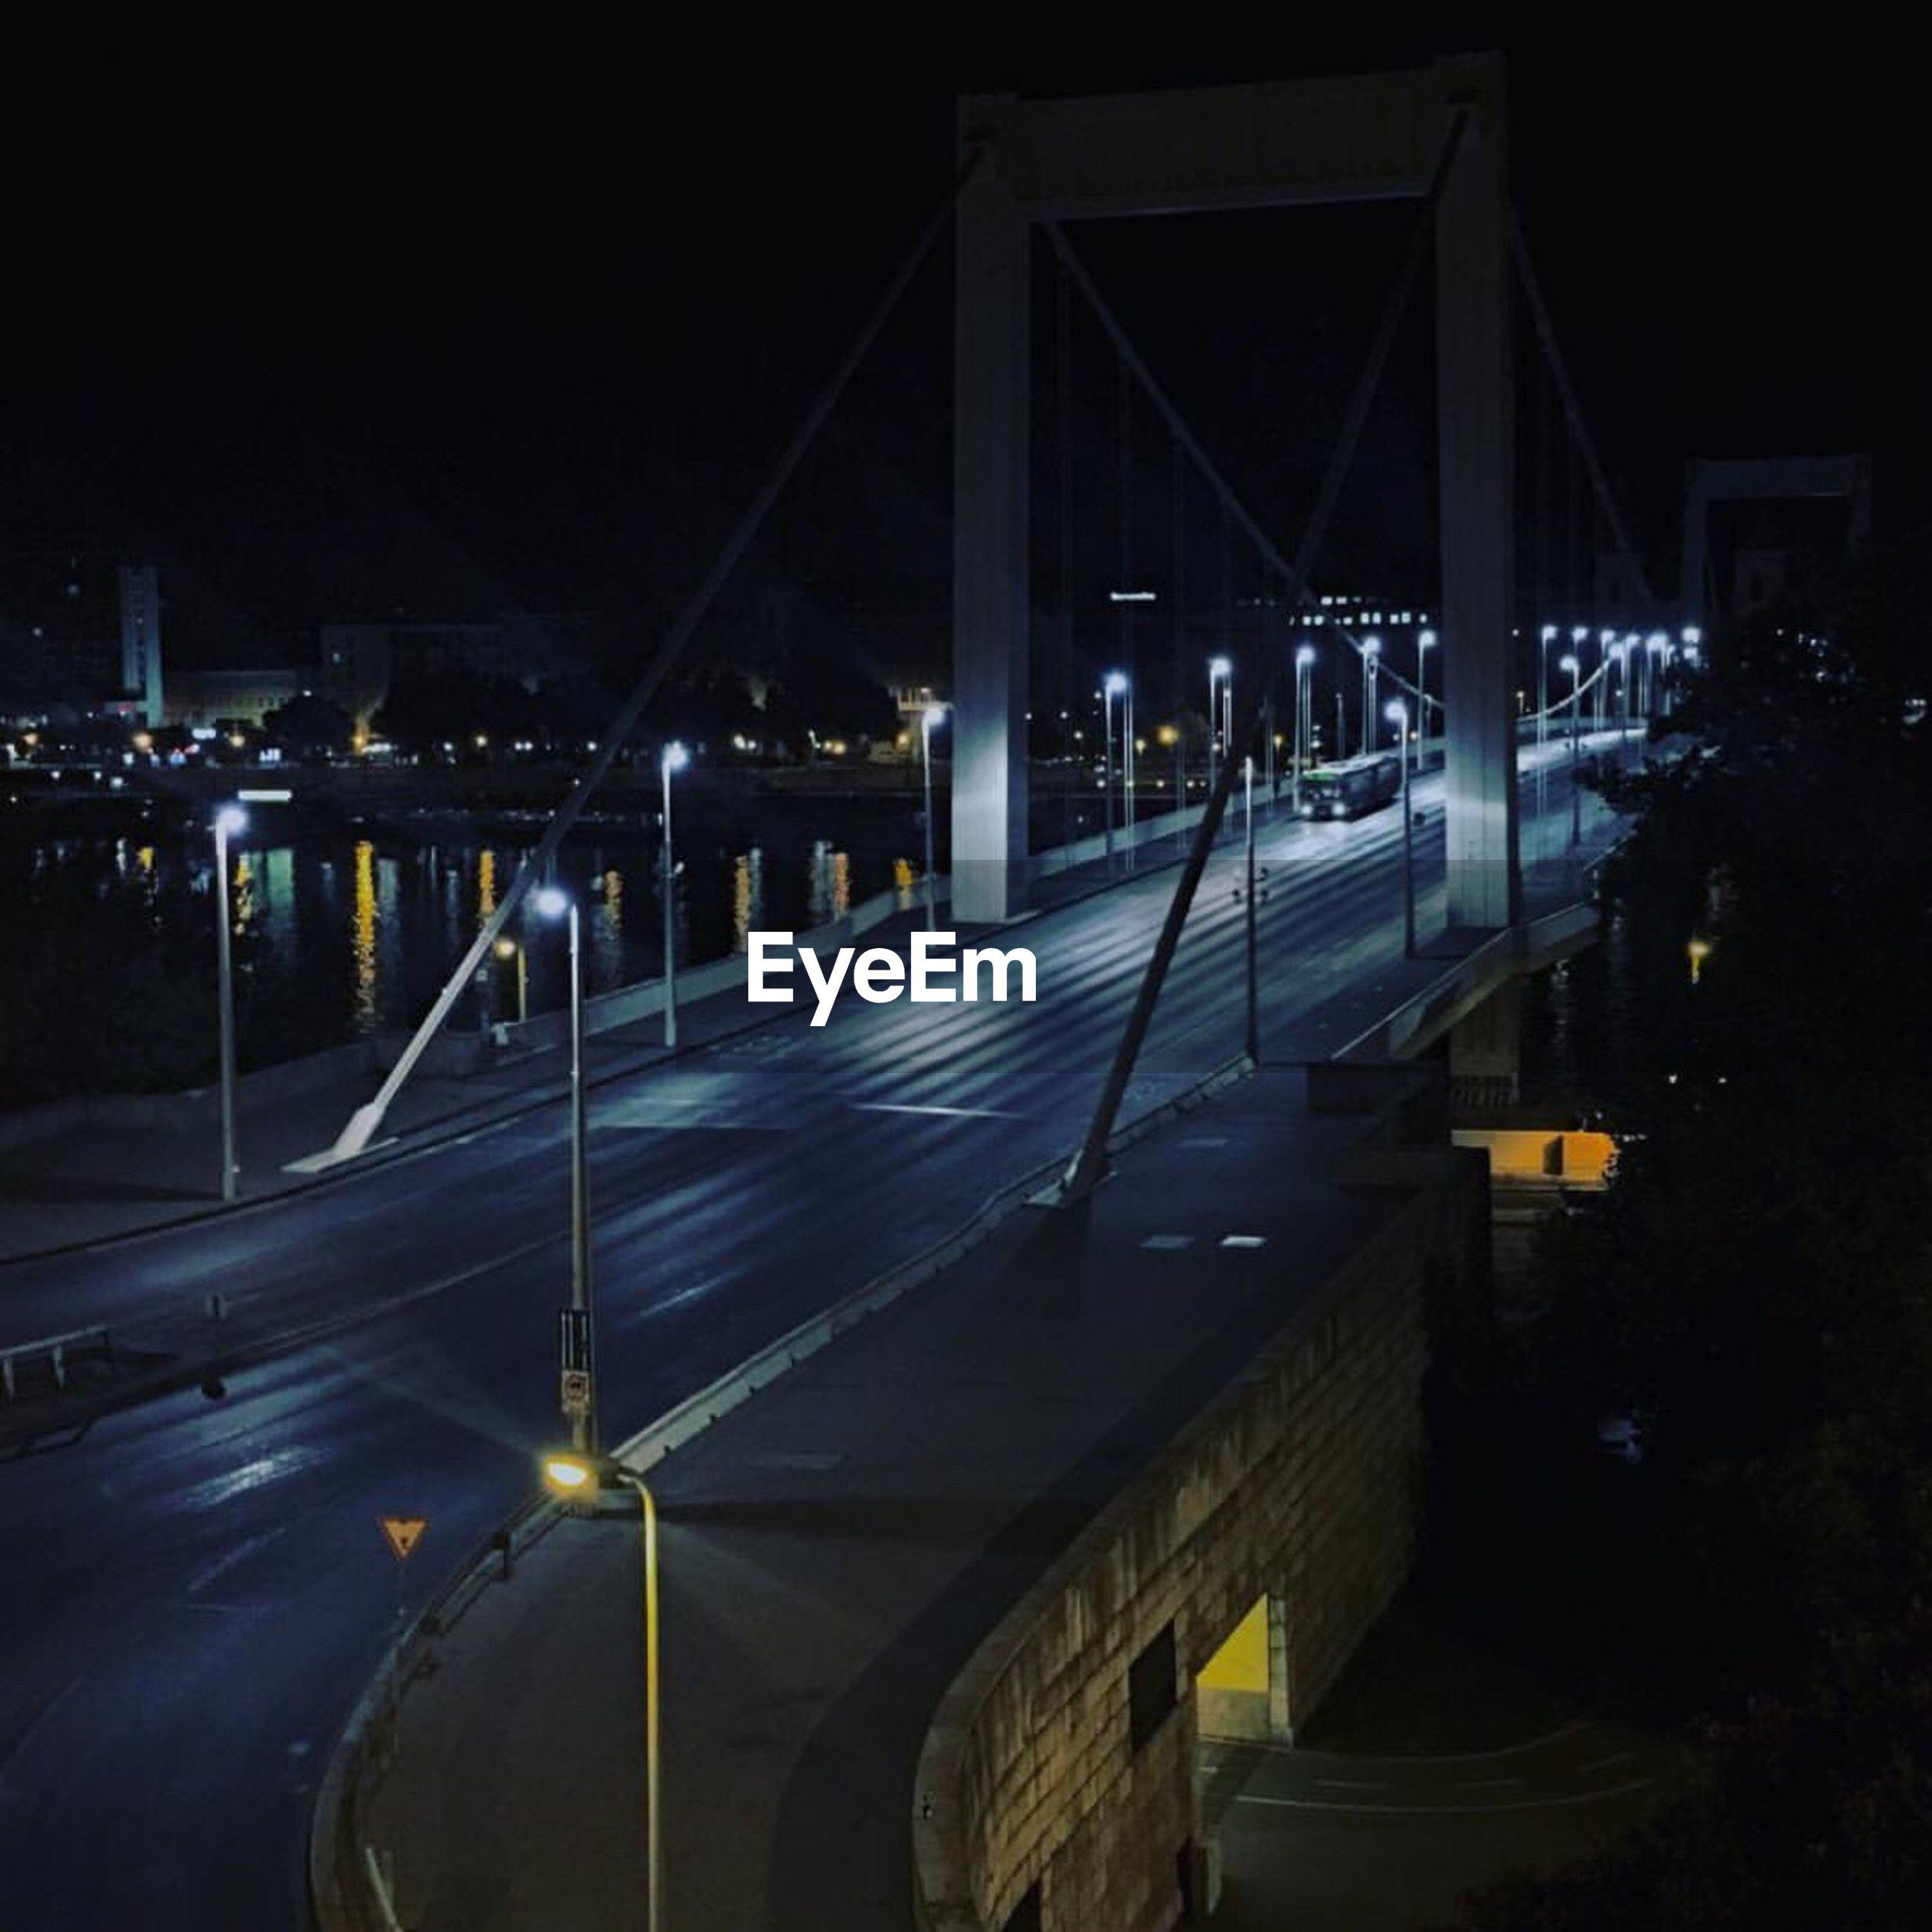 night, illuminated, bridge - man made structure, architecture, transportation, connection, built structure, outdoors, city, road, suspension bridge, no people, building exterior, chain bridge